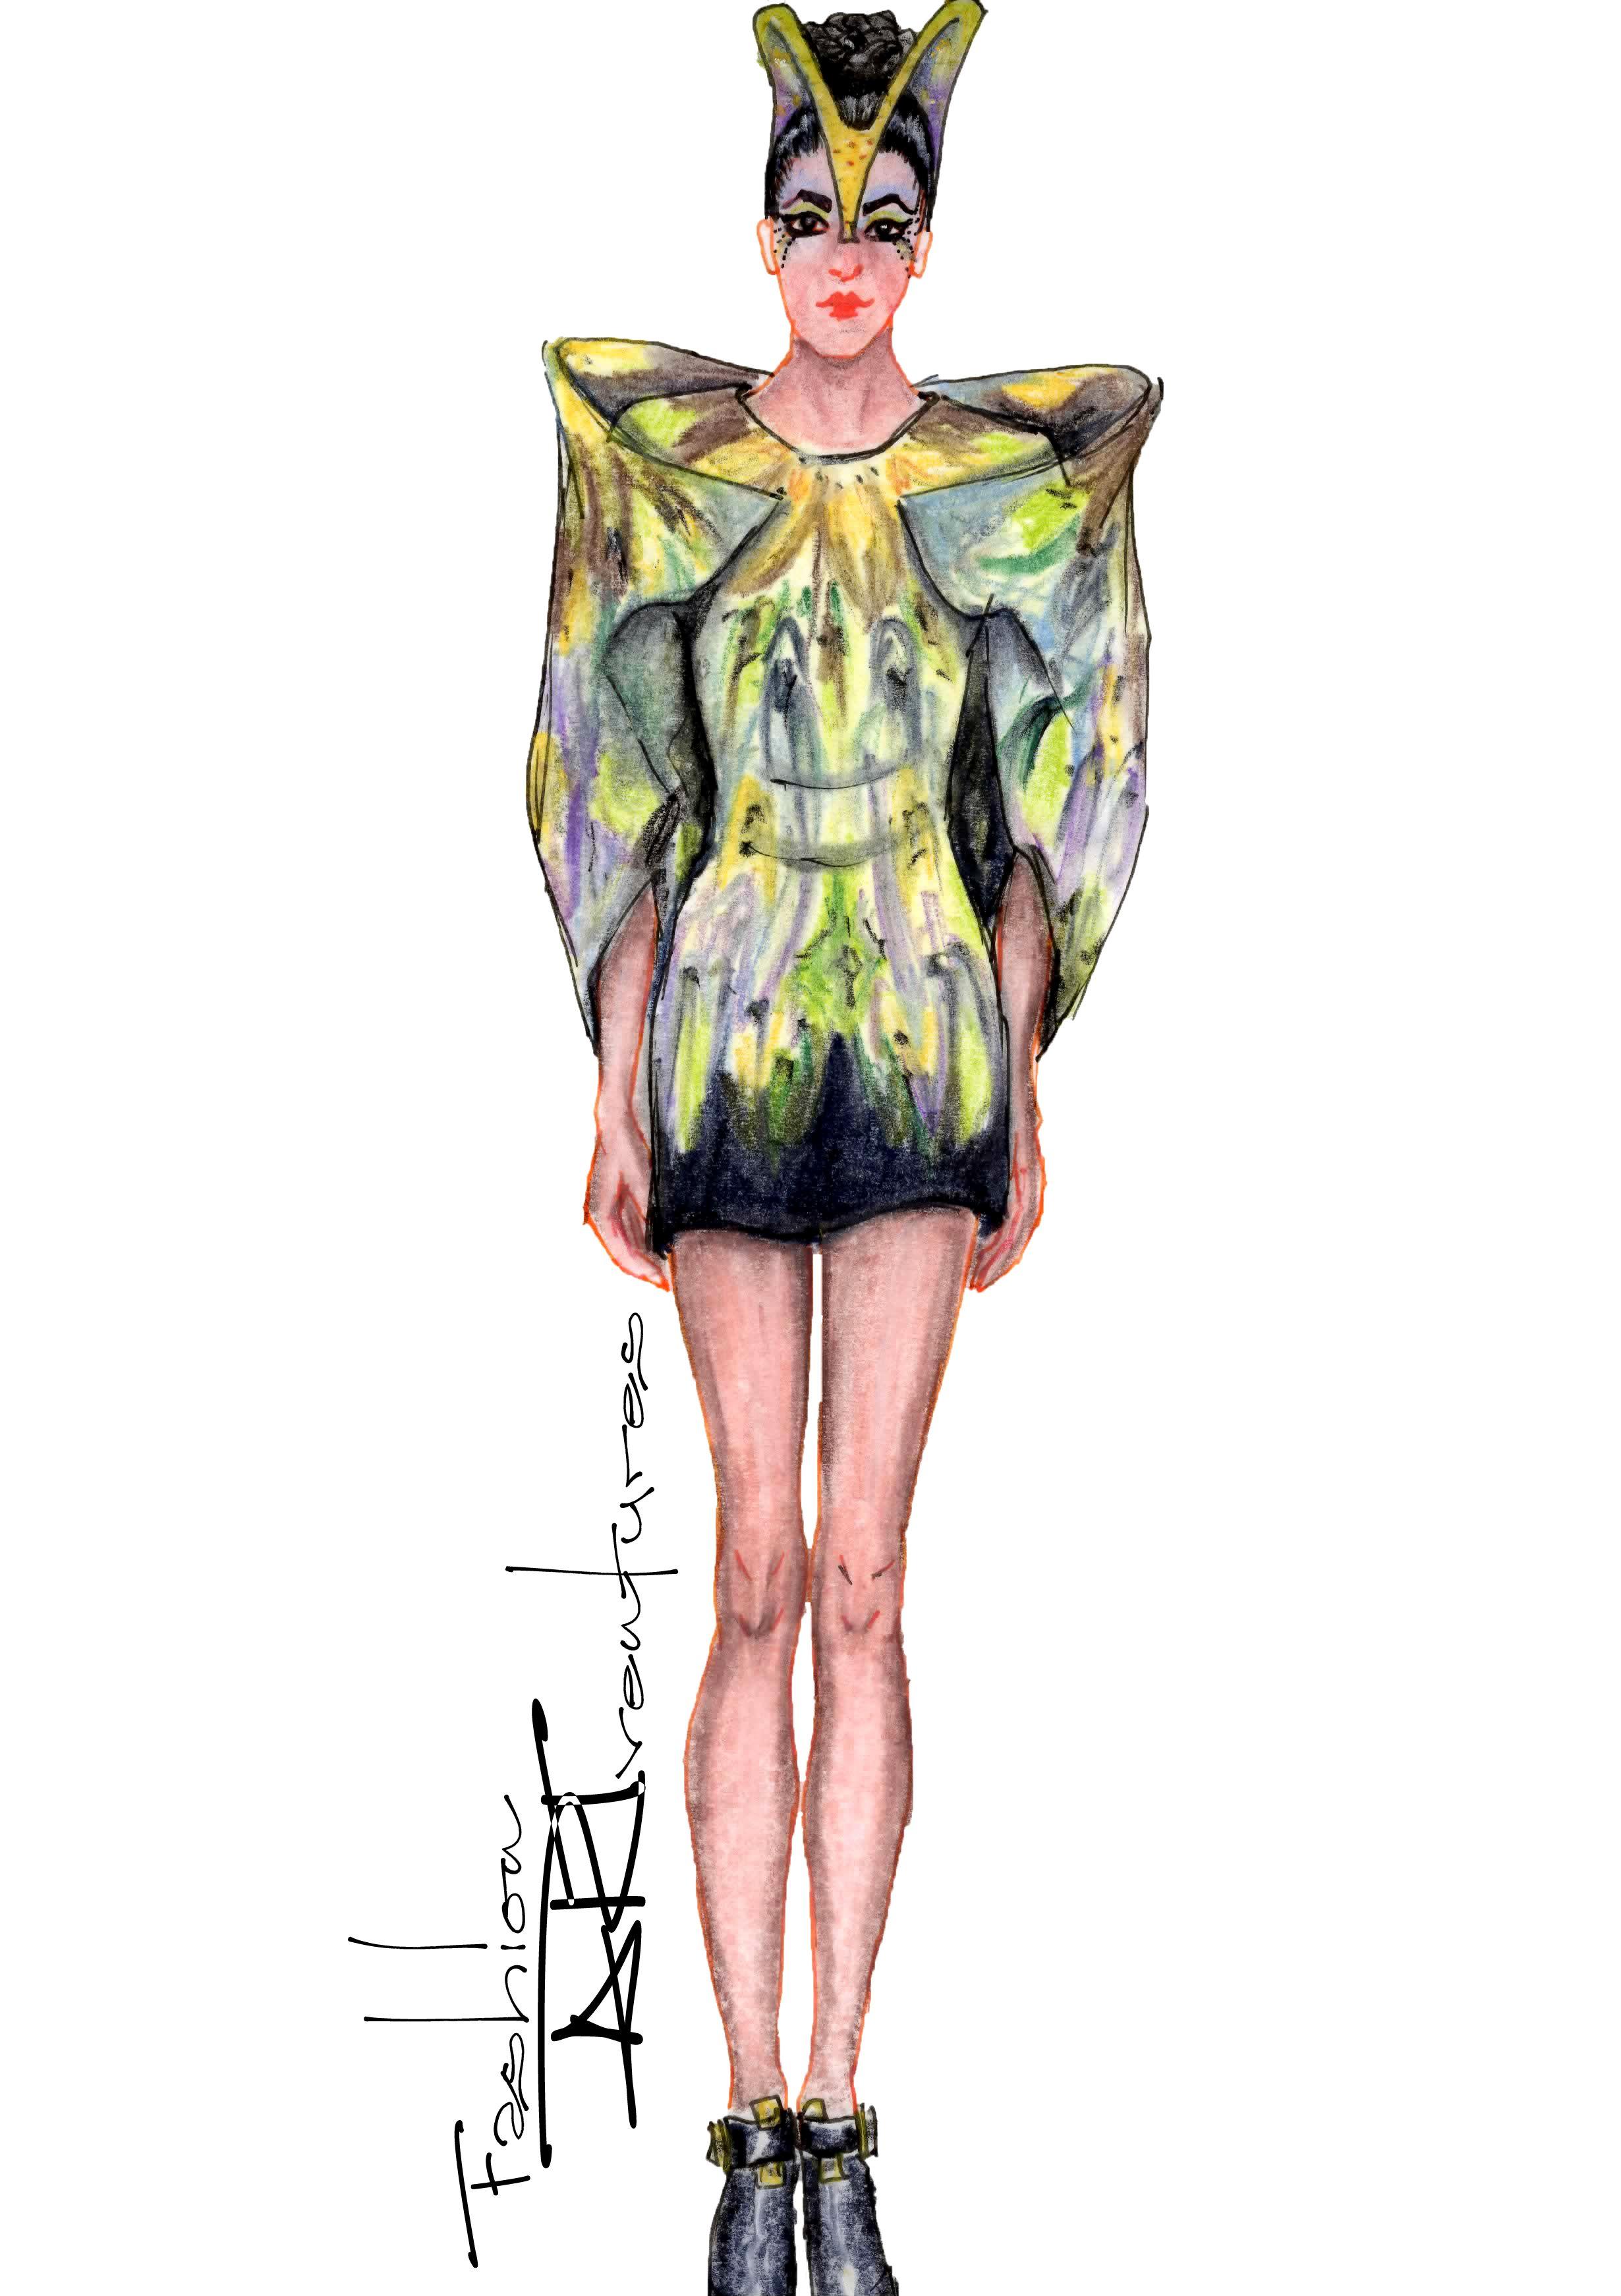 Futuristic Lady Gaga/Alexander McQueen's Plato Atlantis Tutorial